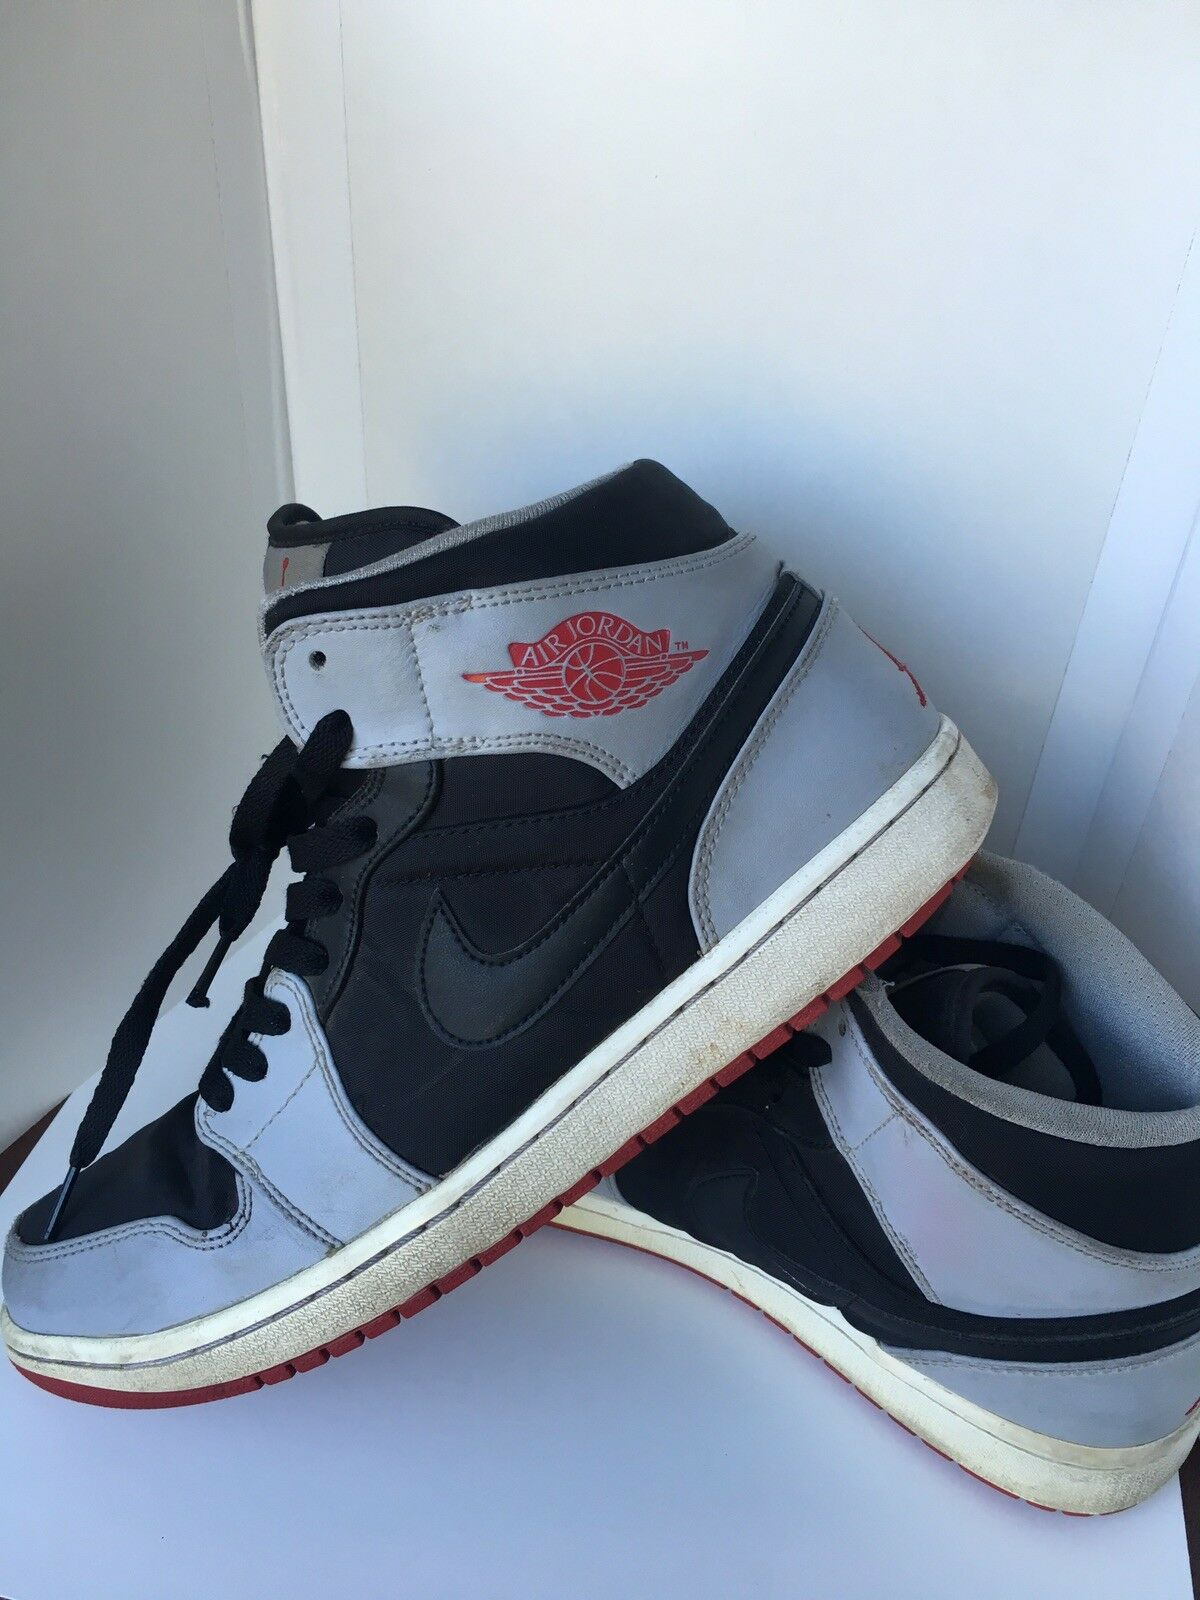 Nike rosse air jordan uomini 1 metà nero grigio scarpe rosse Nike 554724-012 pre possedeva dimensioni 11